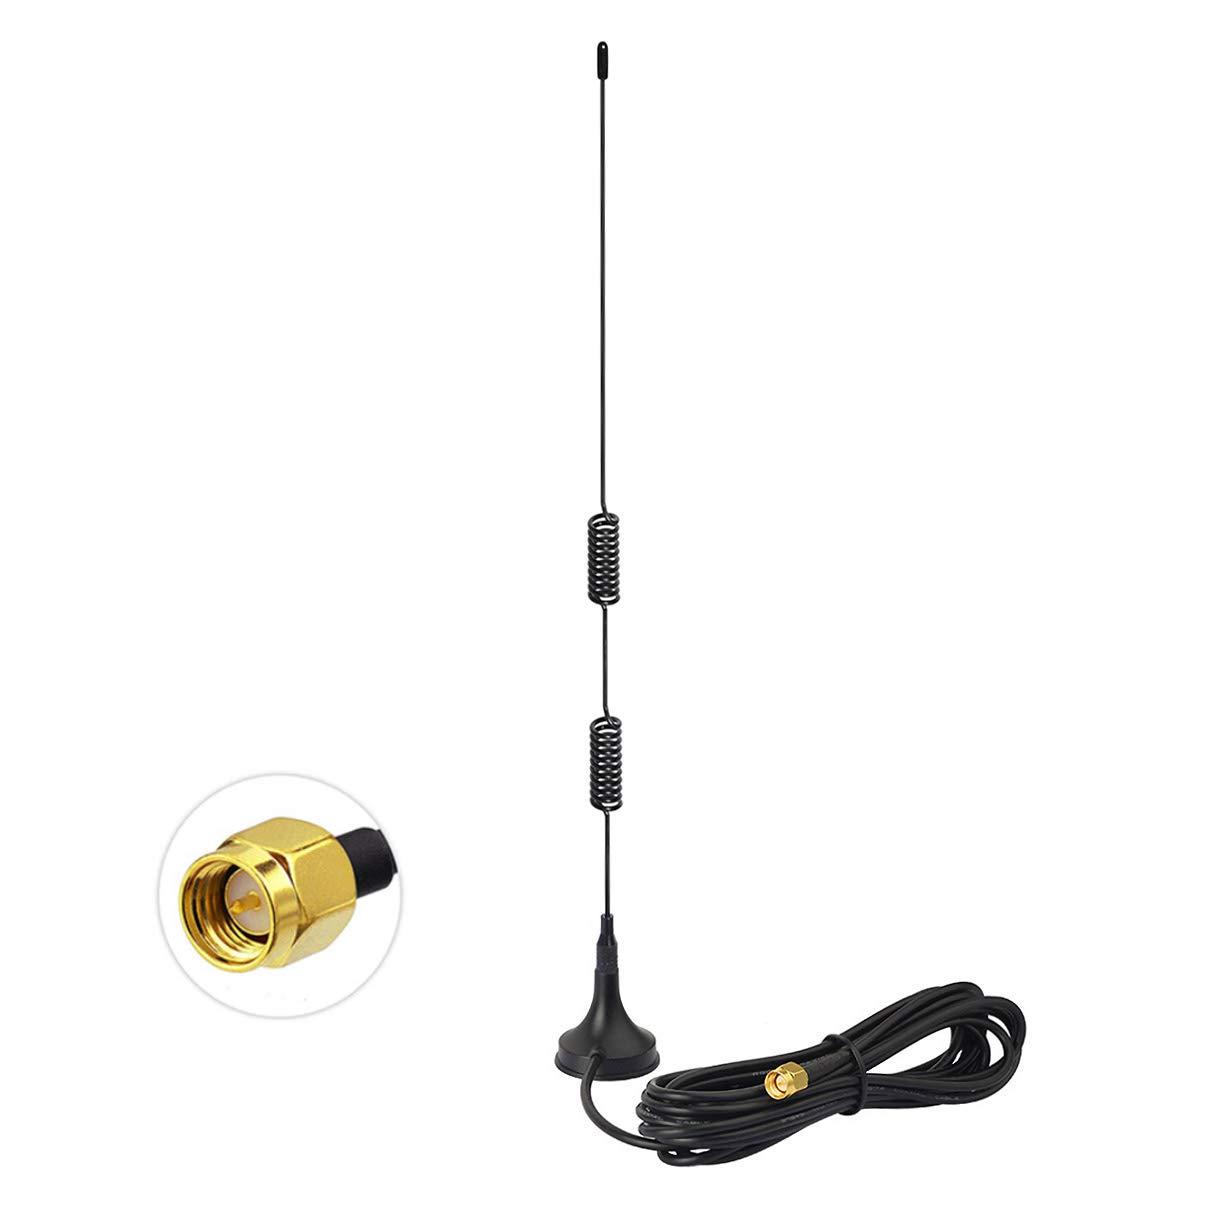 Bingfu Funkger/ät Antenne VHF UHF 136-174 MHz 400-470 MHz Amateurfunk Magnetfu/ß SMA-Stecker Antenne Kompatibel mit Handfunkger/ät Walkie Talkie YAESU VERTAX VX-3R VX-5R VX-6R VX-7R BaoFeng UV-3R